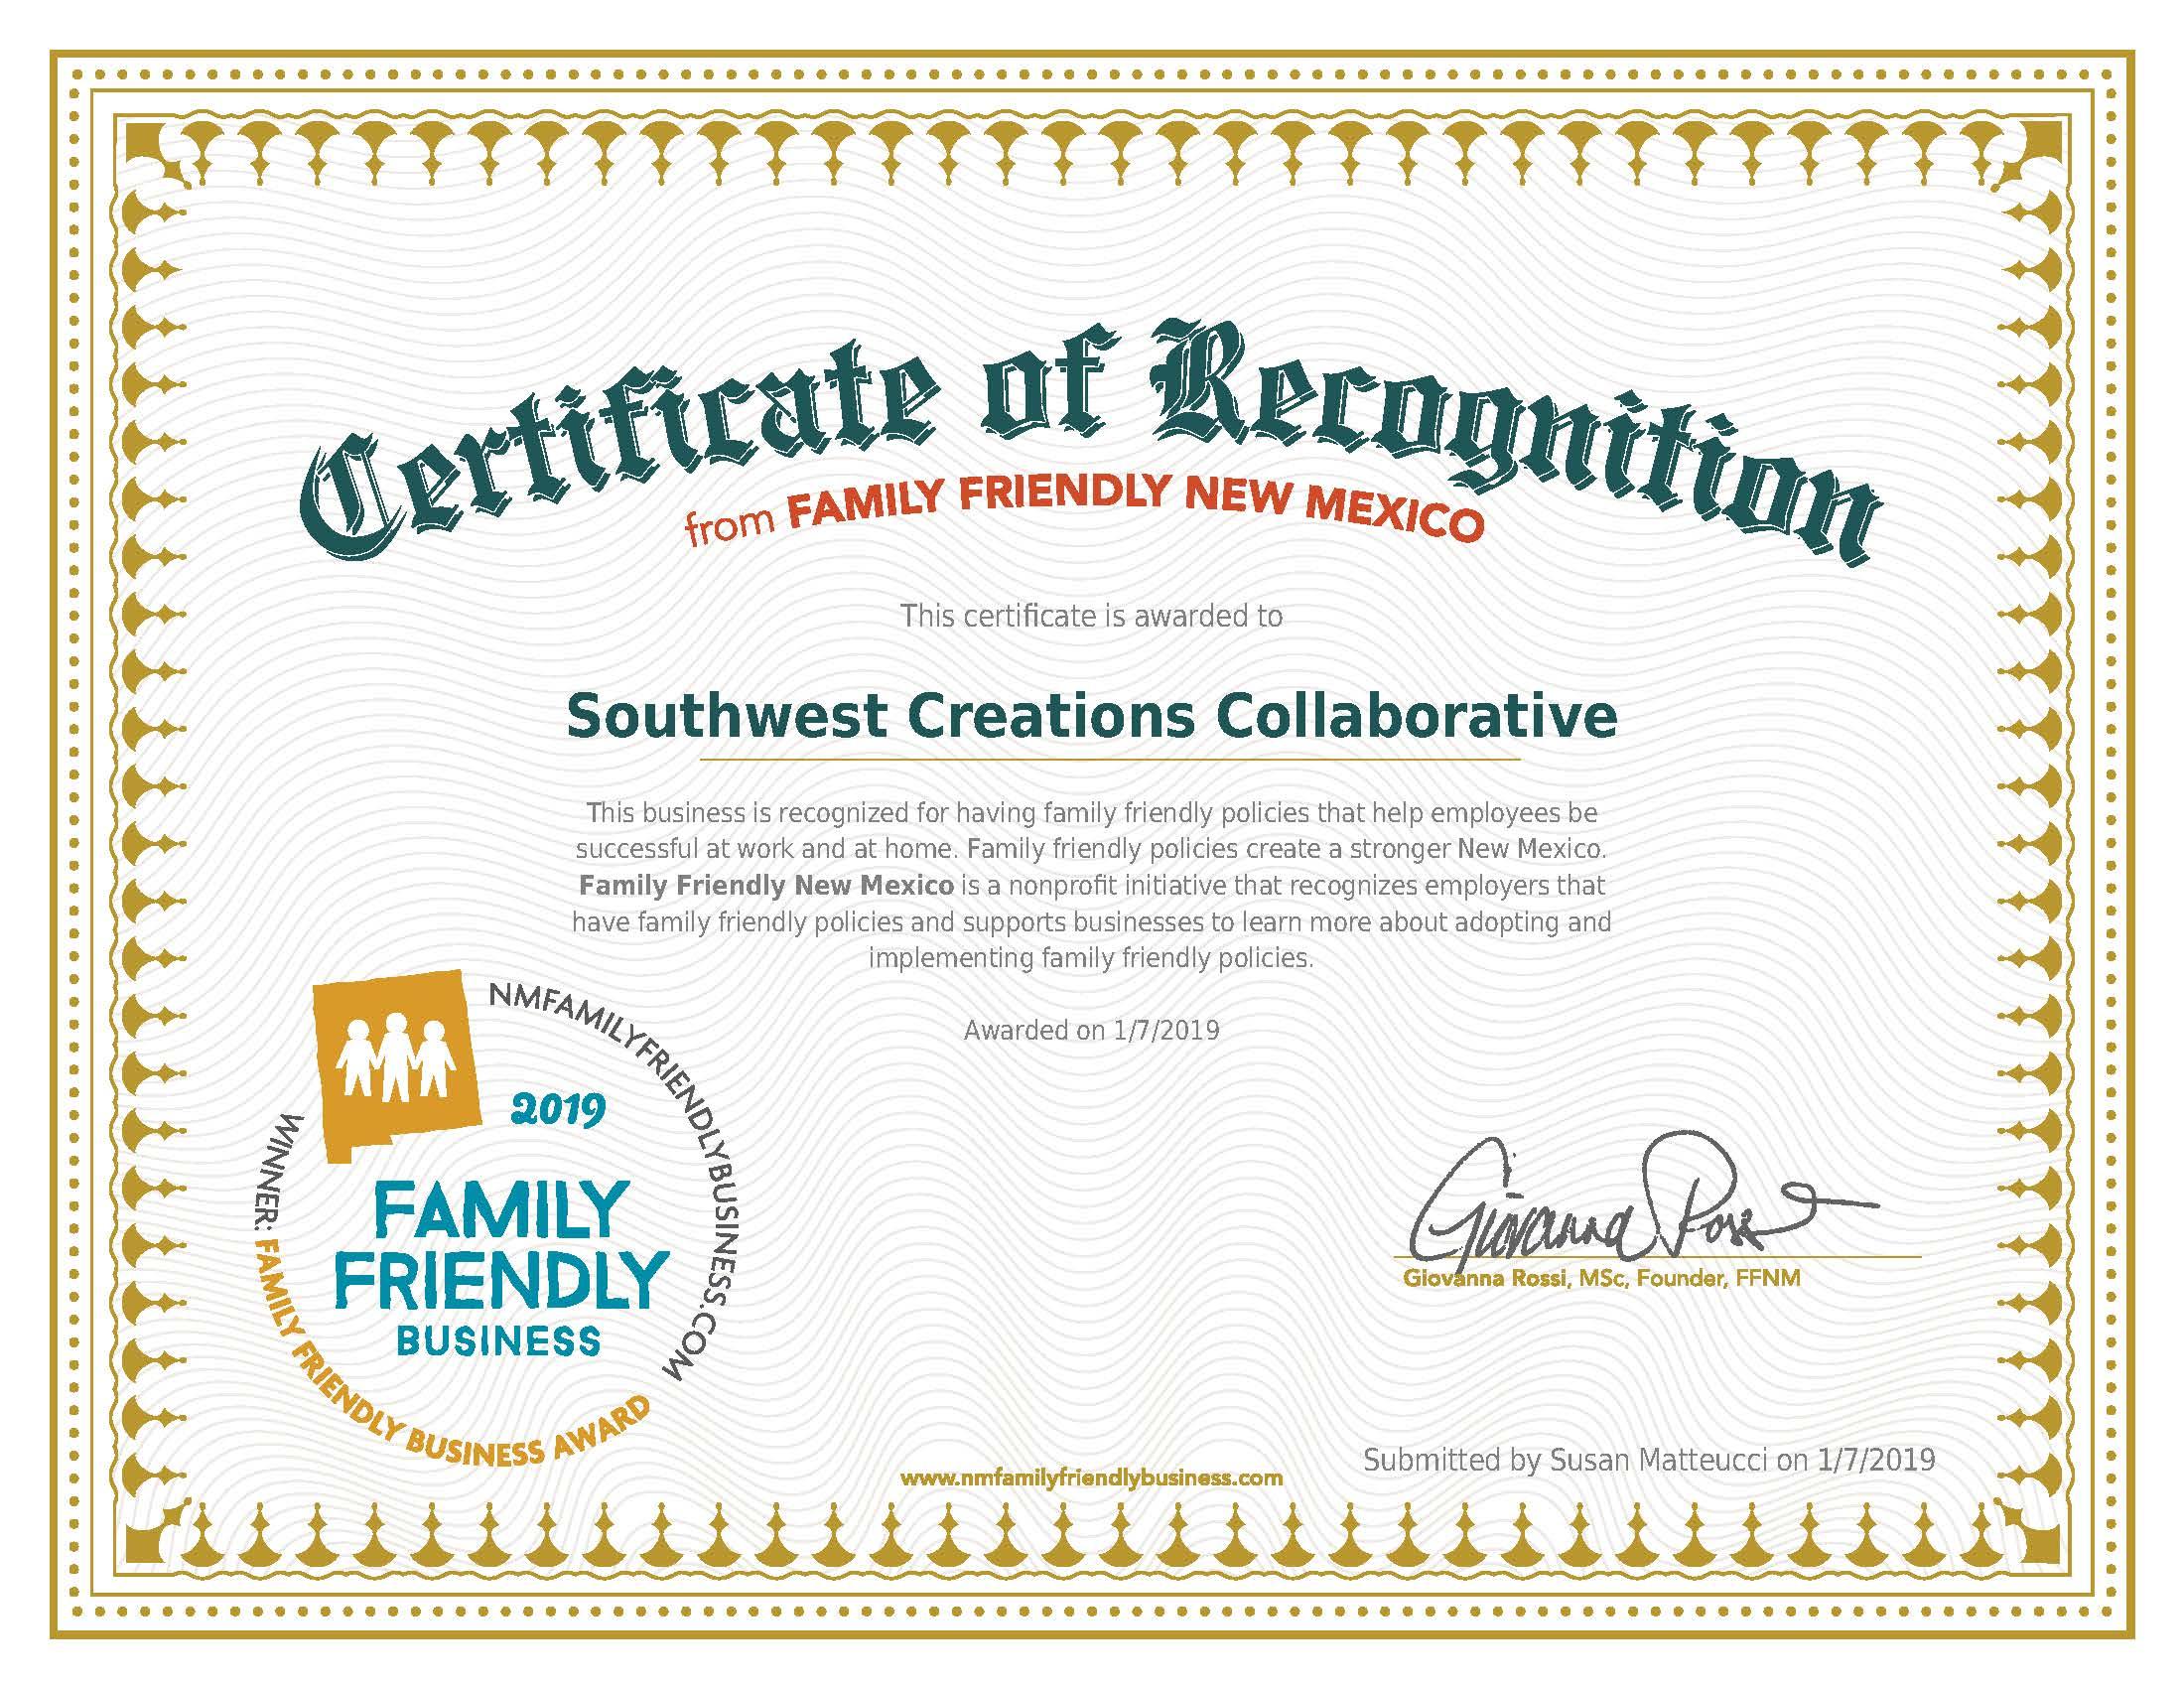 19NMFFBAward-Gold-Southwest Creations Collaborative-01_07_2019.jpg